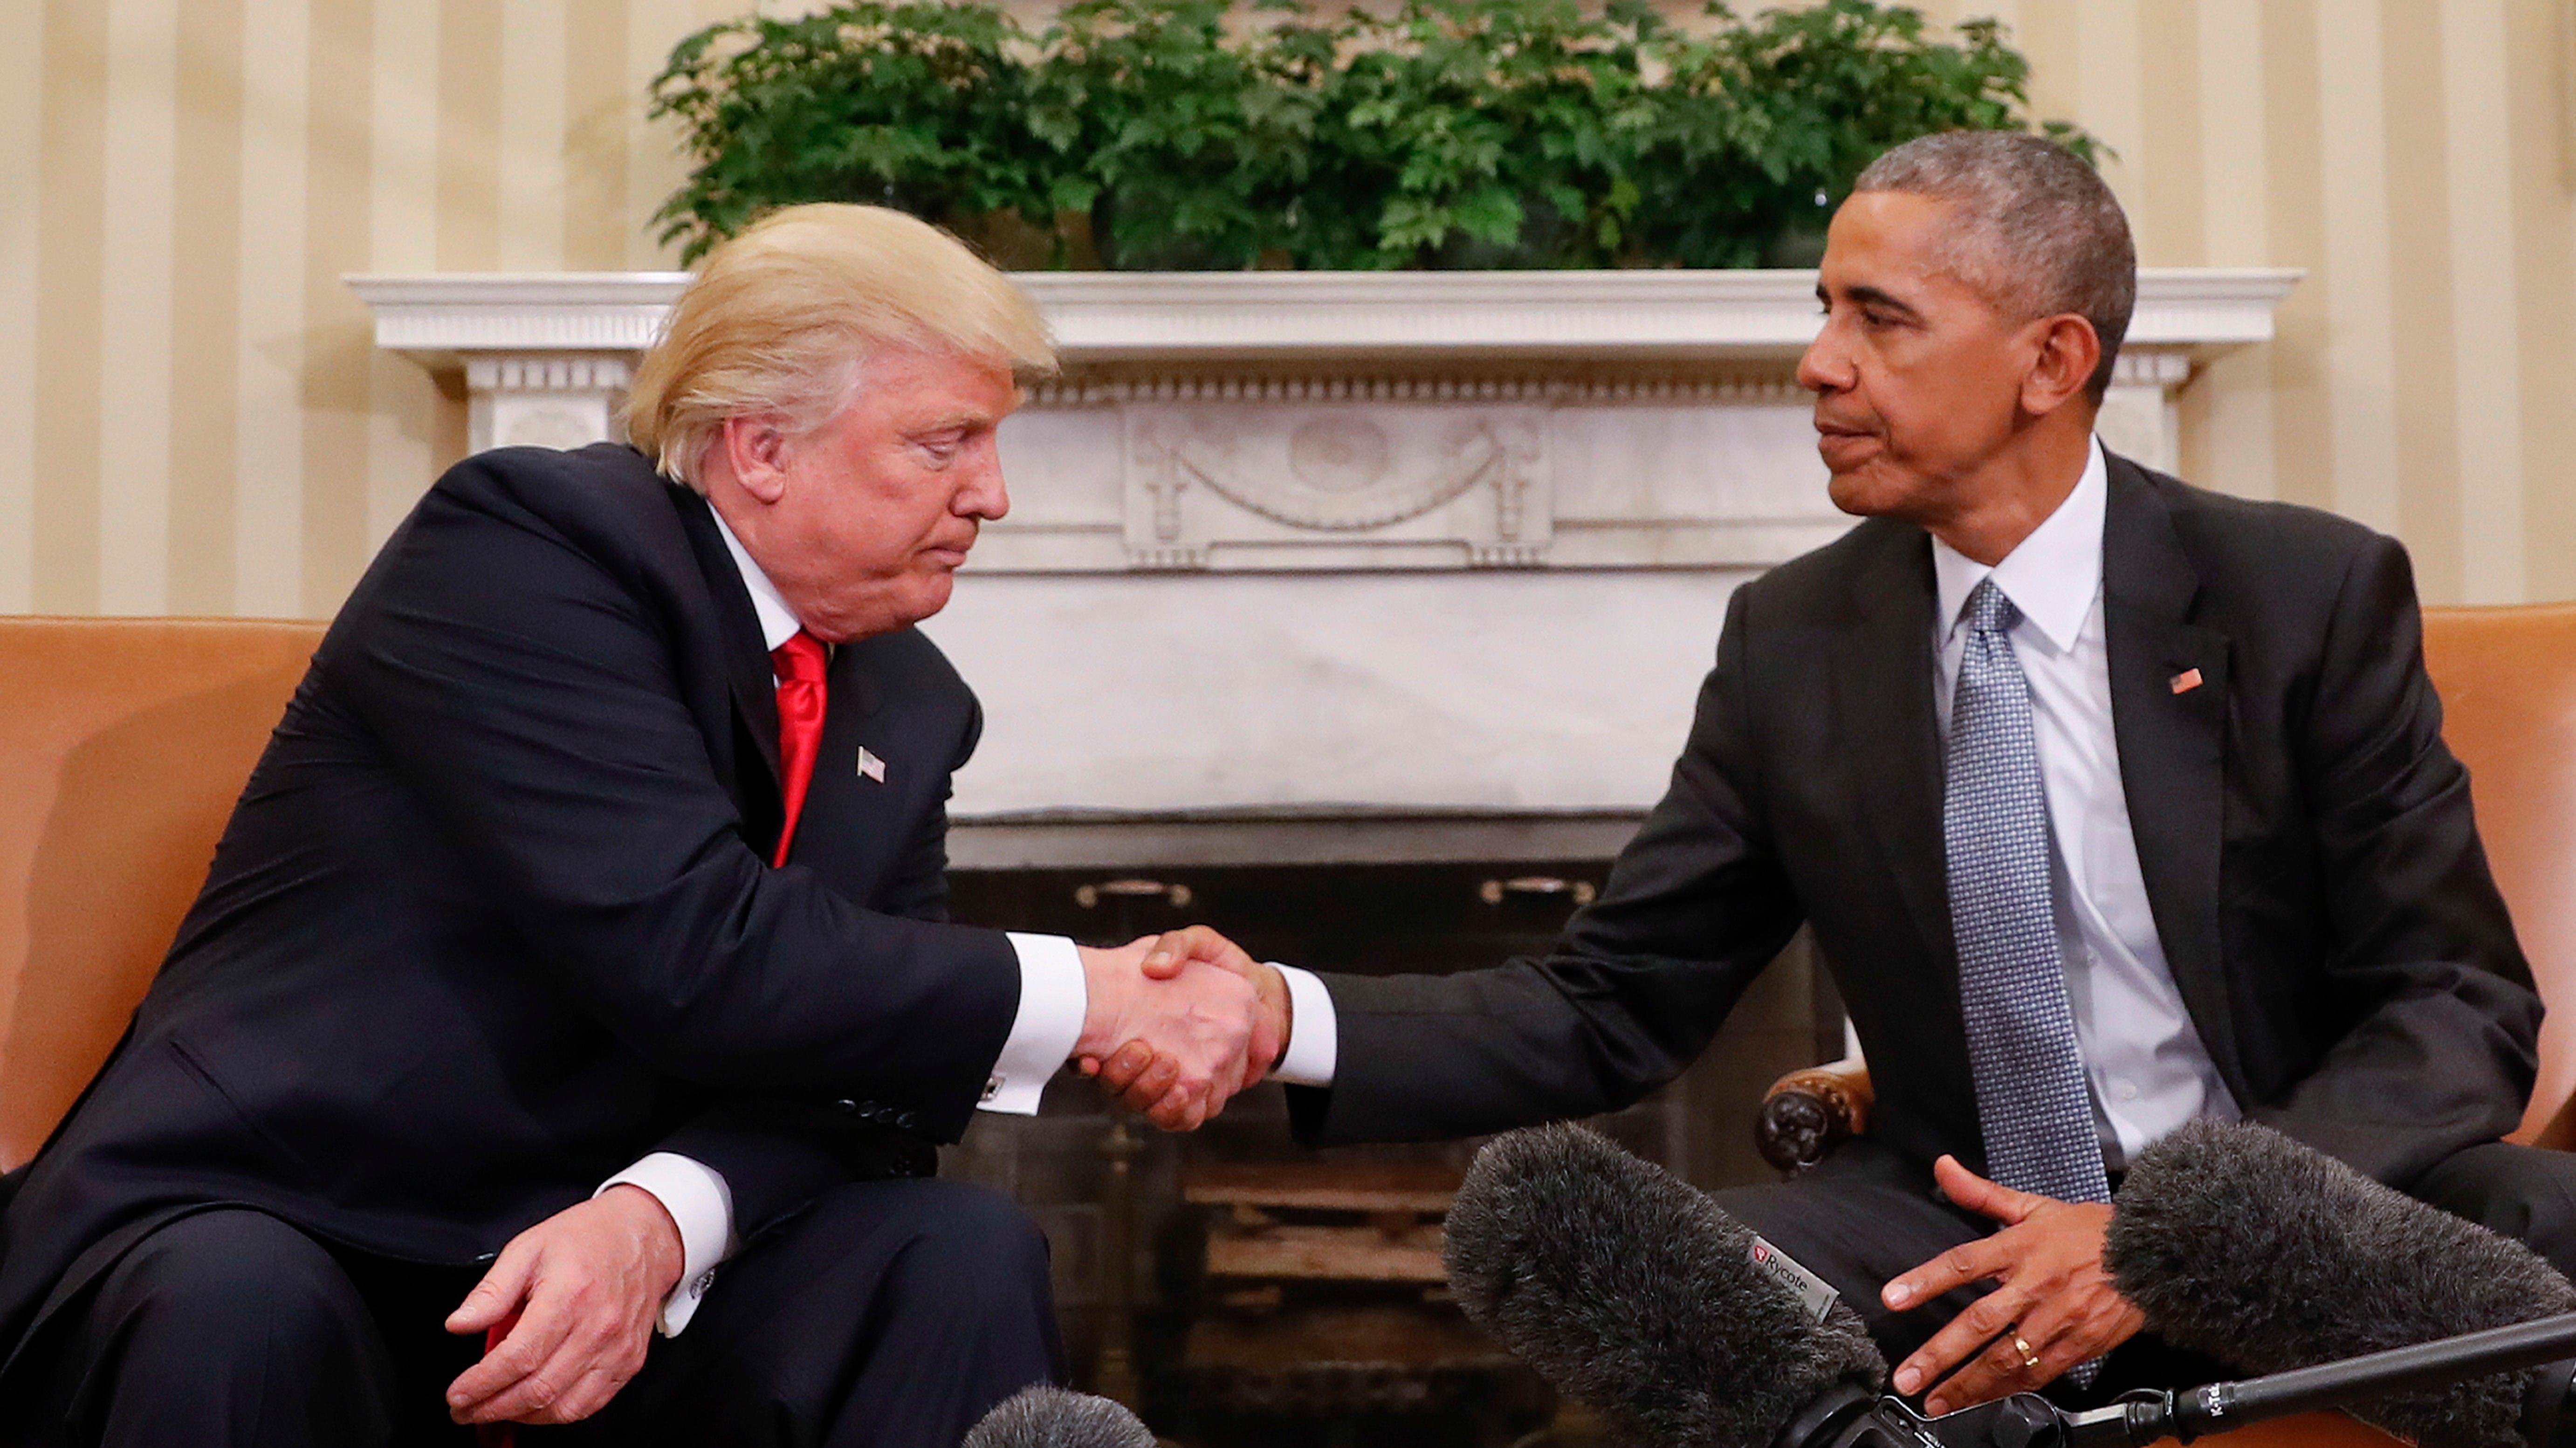 President Trump: I won't yank Barack Obama's security clearance